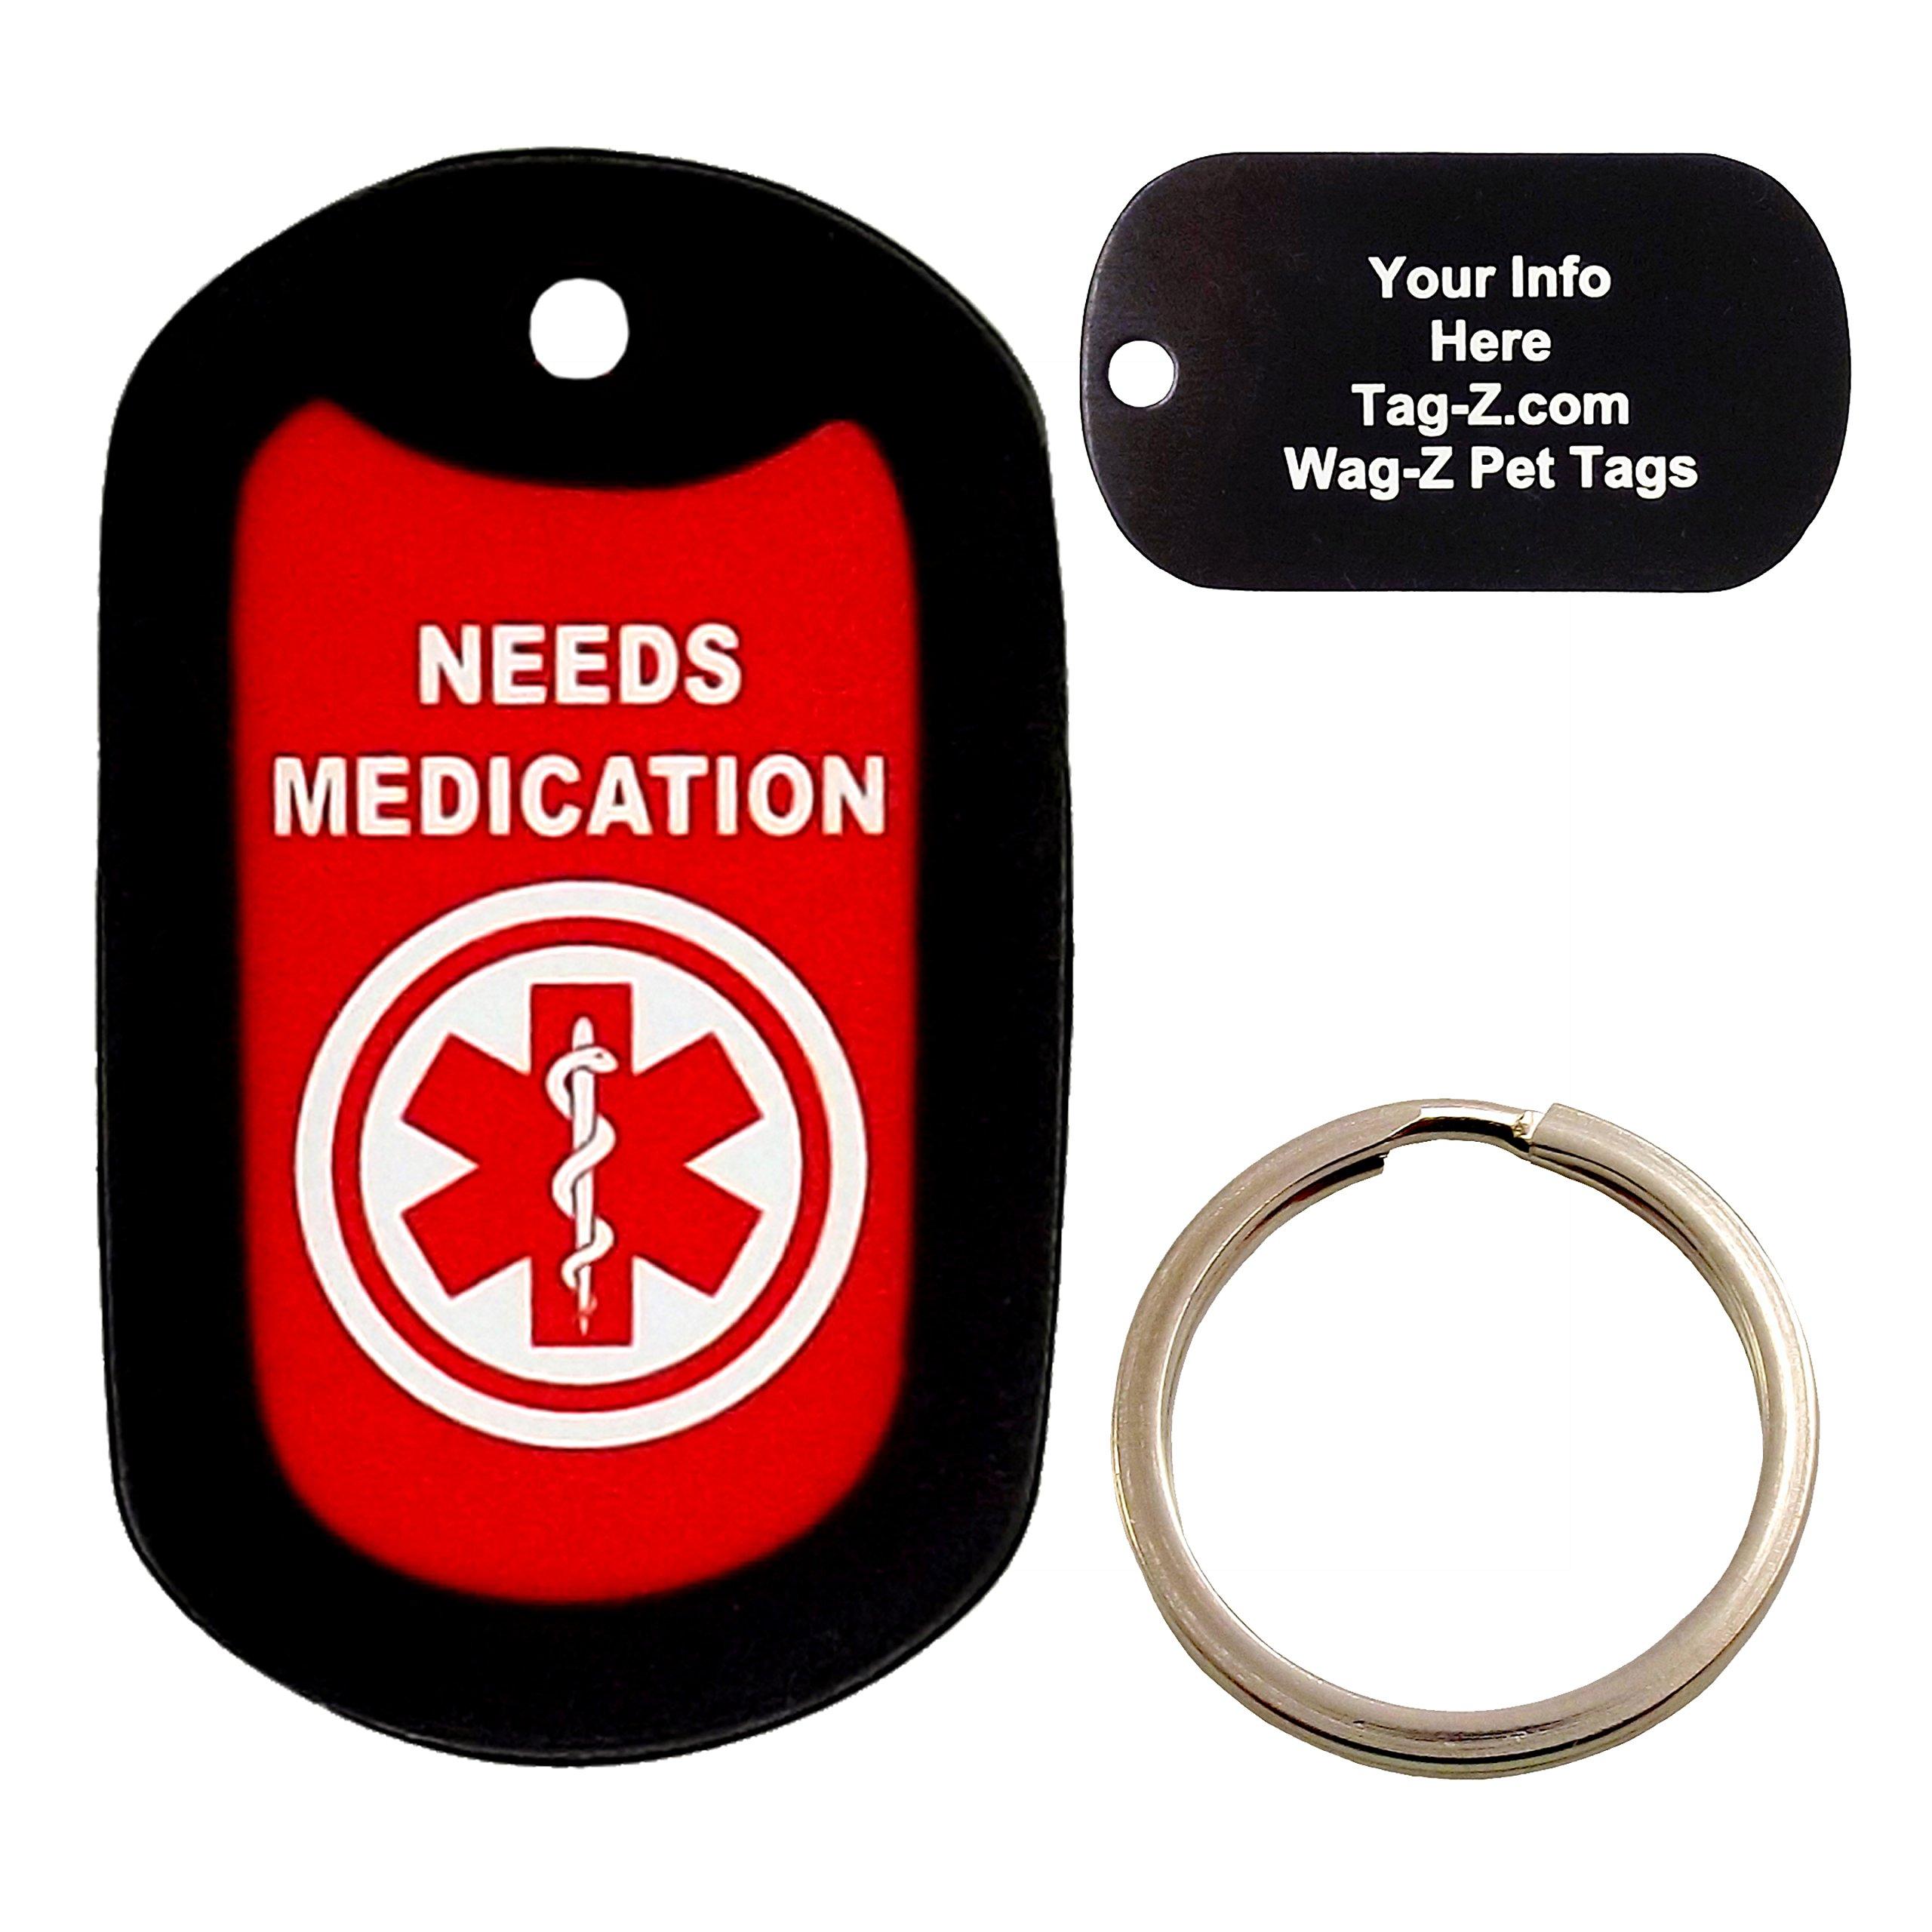 Custom Engraved Pet Tag - Needs Medication